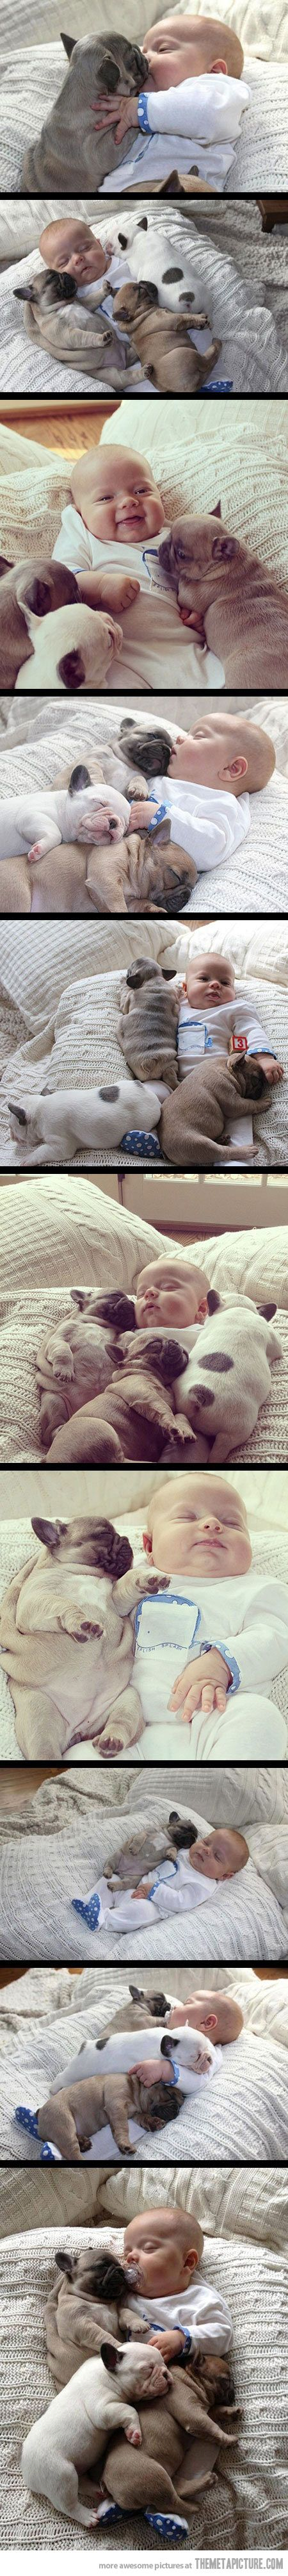 Cuteness overload.